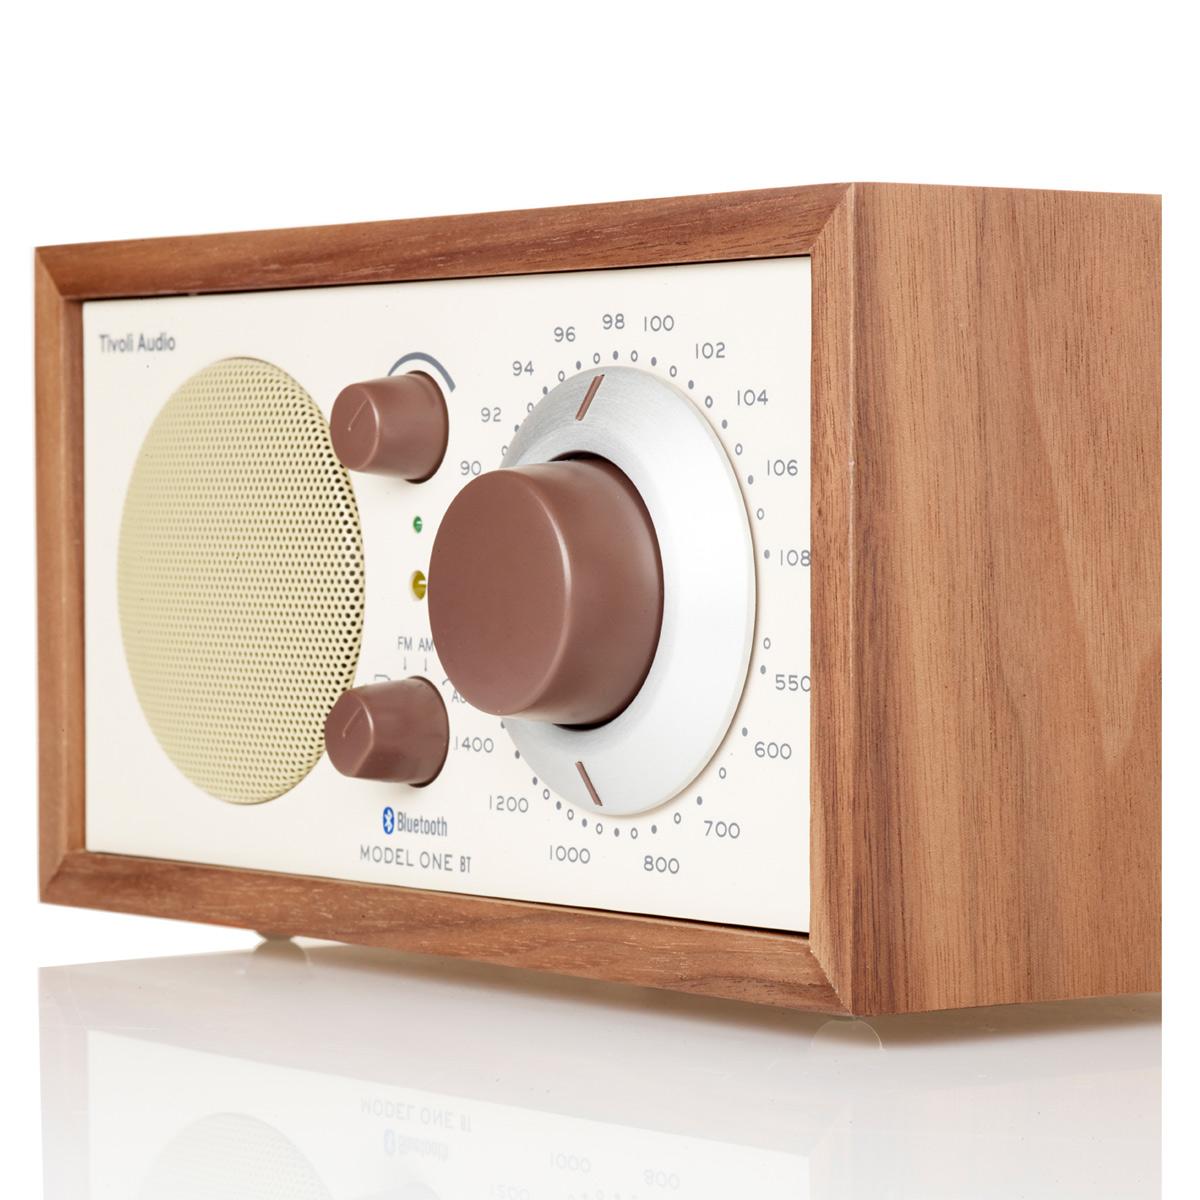 tivoli audio model one am fm radio with bluetooth ebay. Black Bedroom Furniture Sets. Home Design Ideas